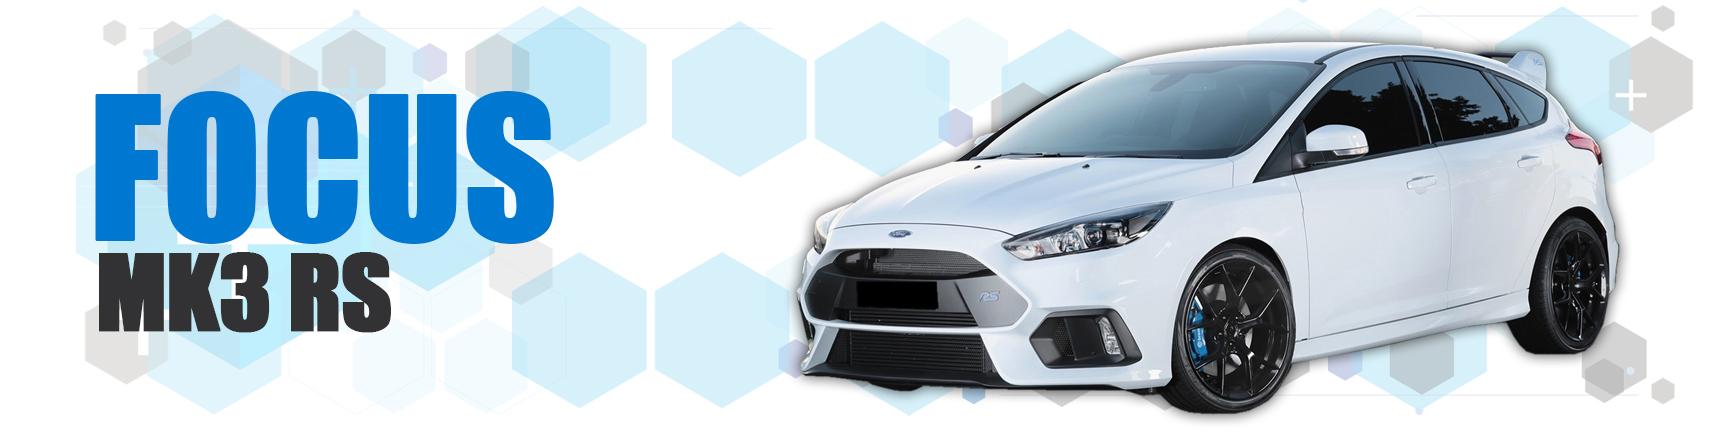 Focus RS Mk3 (2016-2018)